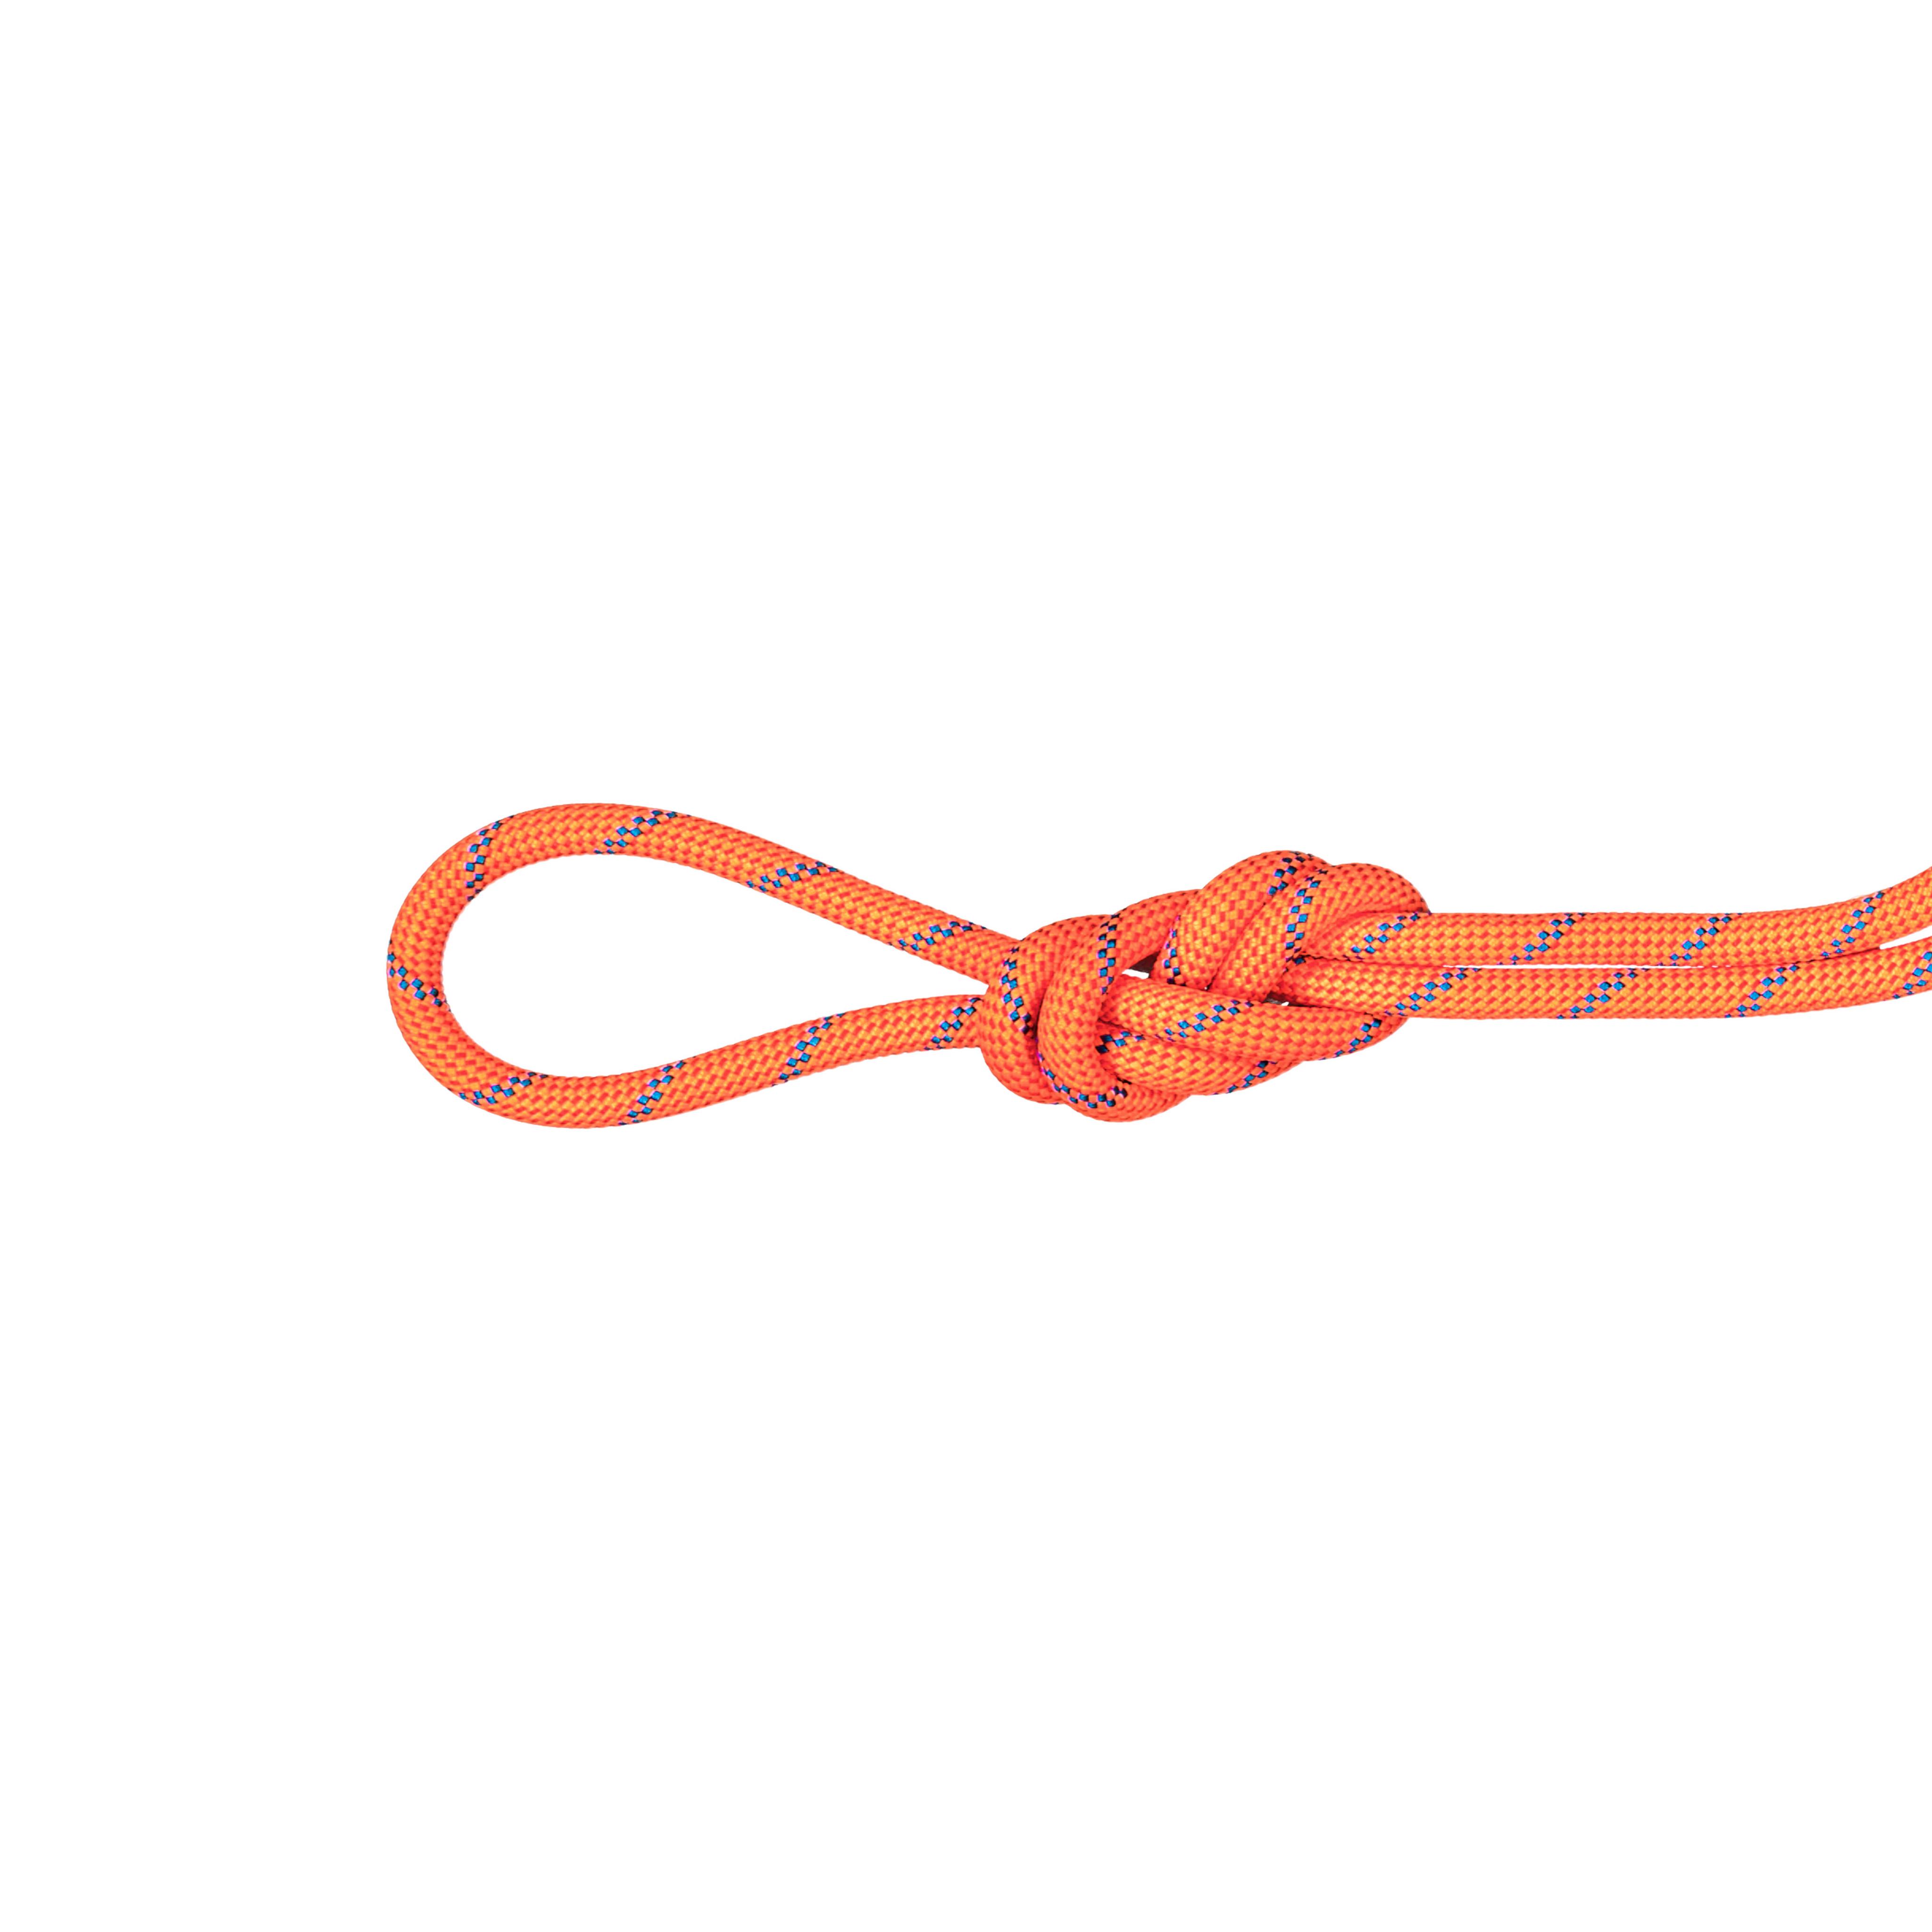 7.5 Alpine Sender Dry Rope - 60 m, Dry Standard, fire-blue thumbnail